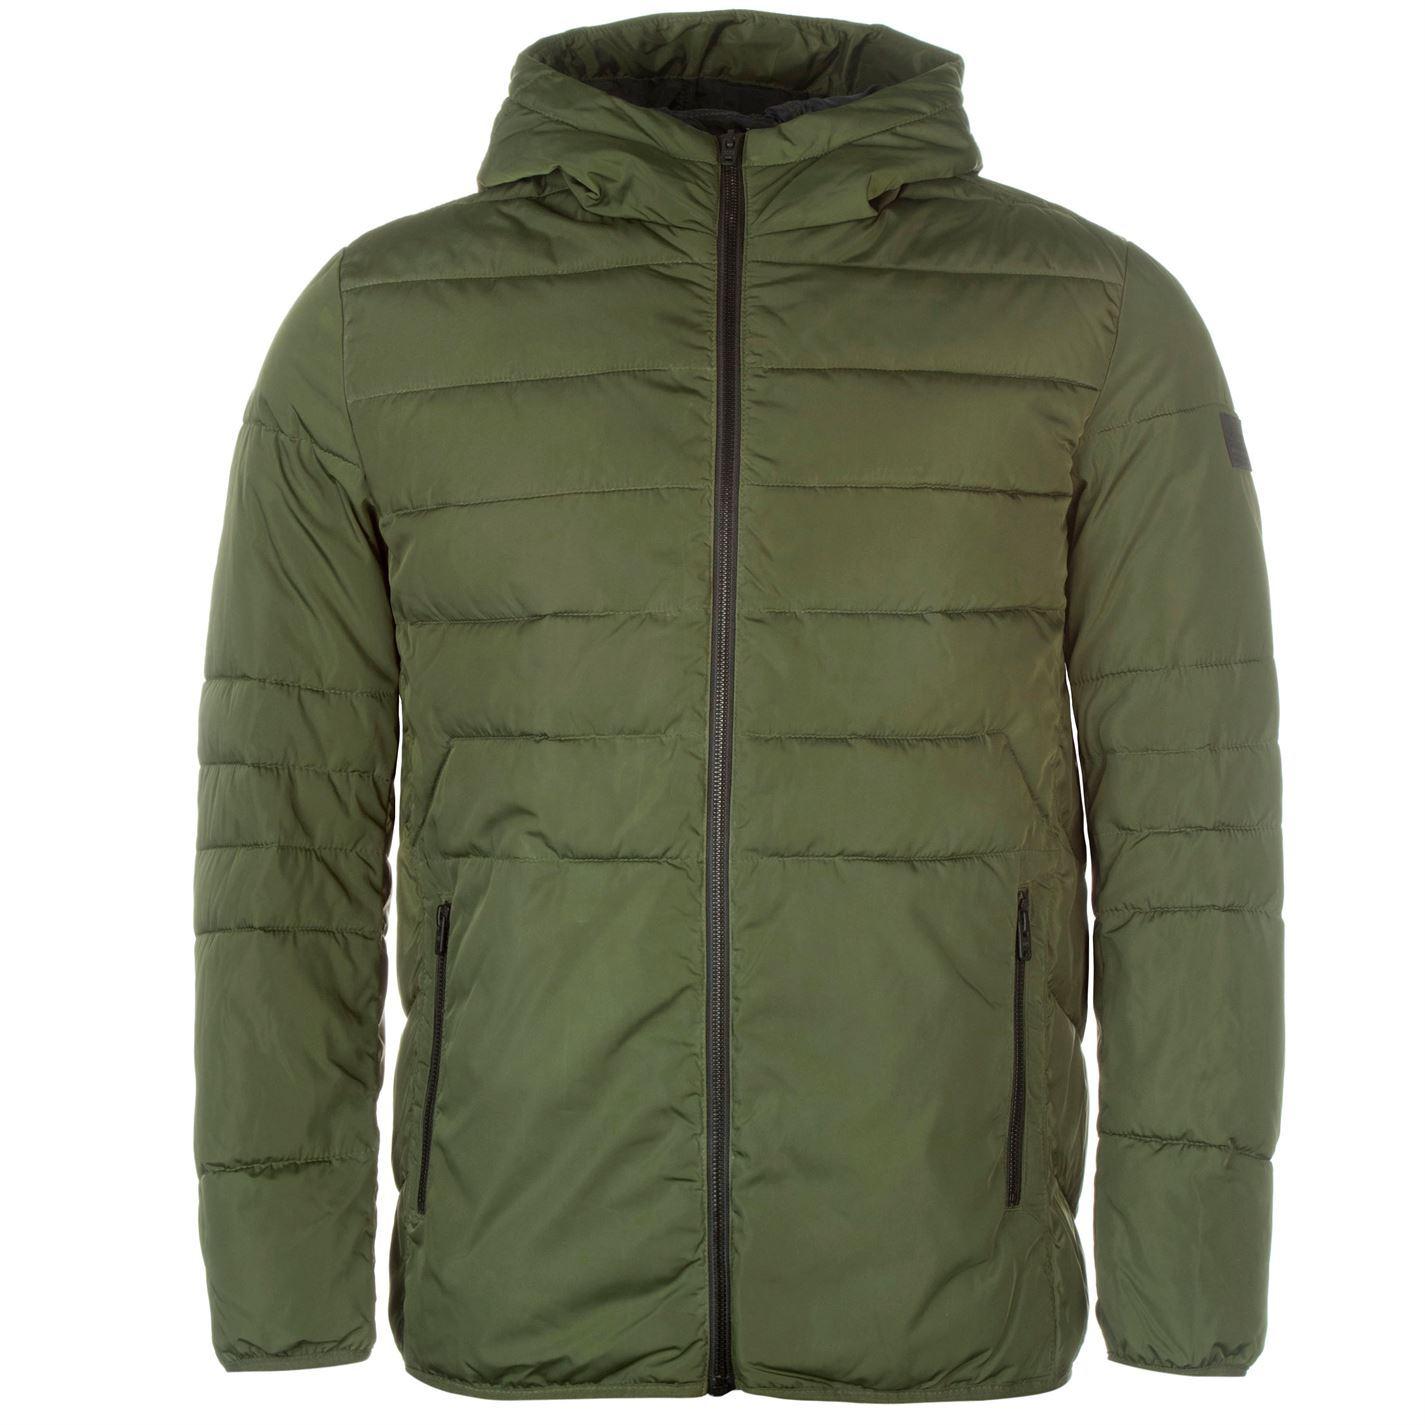 Core Jack Mens Jacket Zip Coat Hooded Top Padded Orbin and Jones qtR4rwnFZt